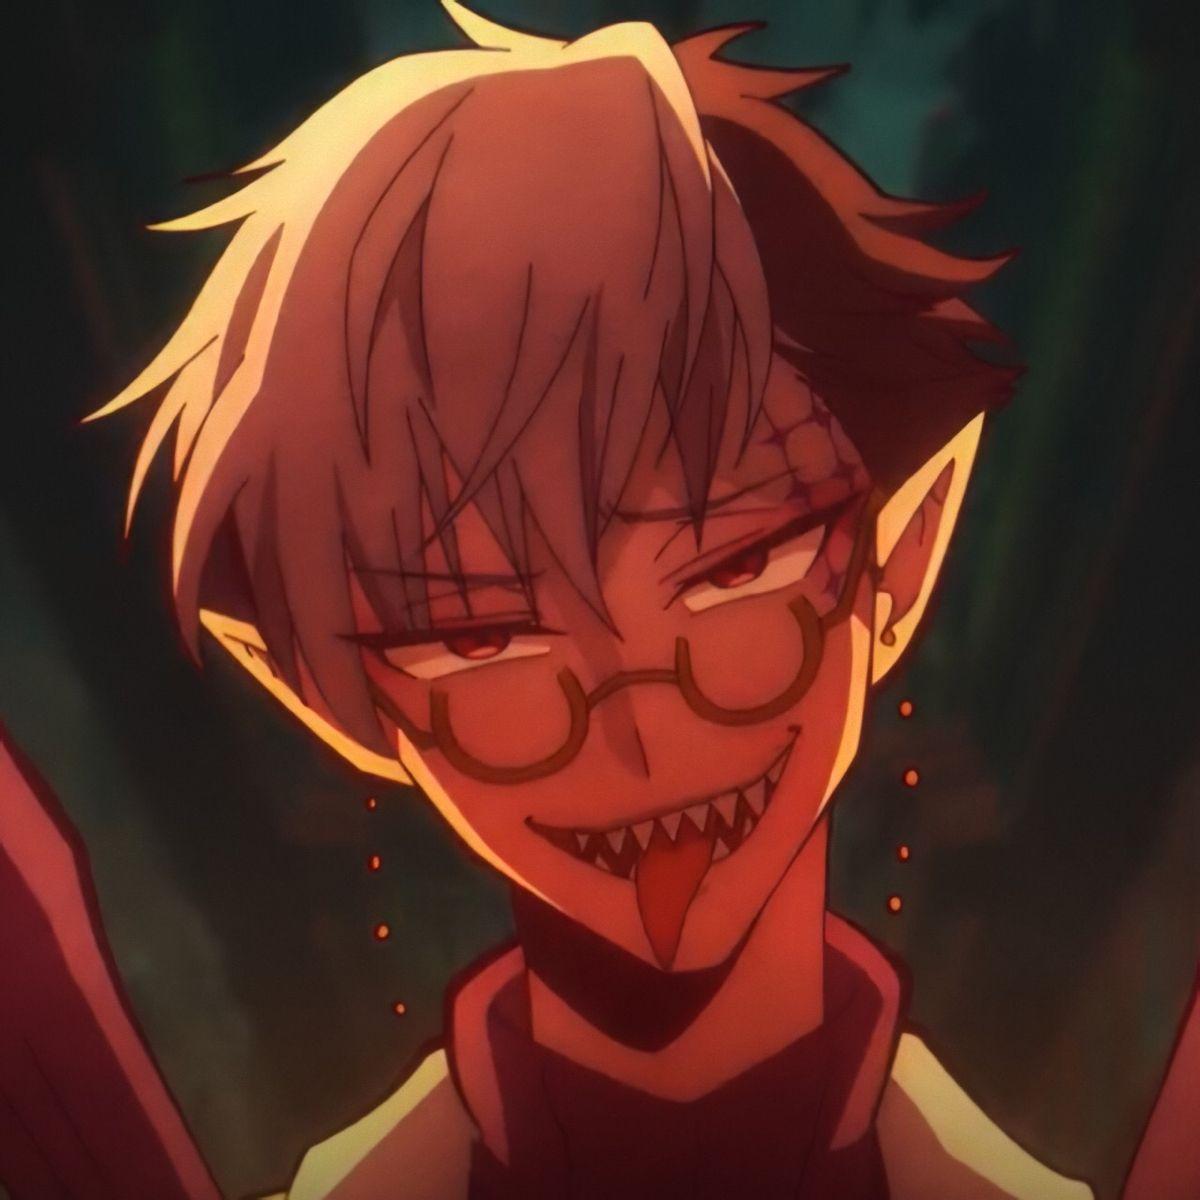 Tsuchigomori In 2020 Aesthetic Anime Anime Kawaii Anime